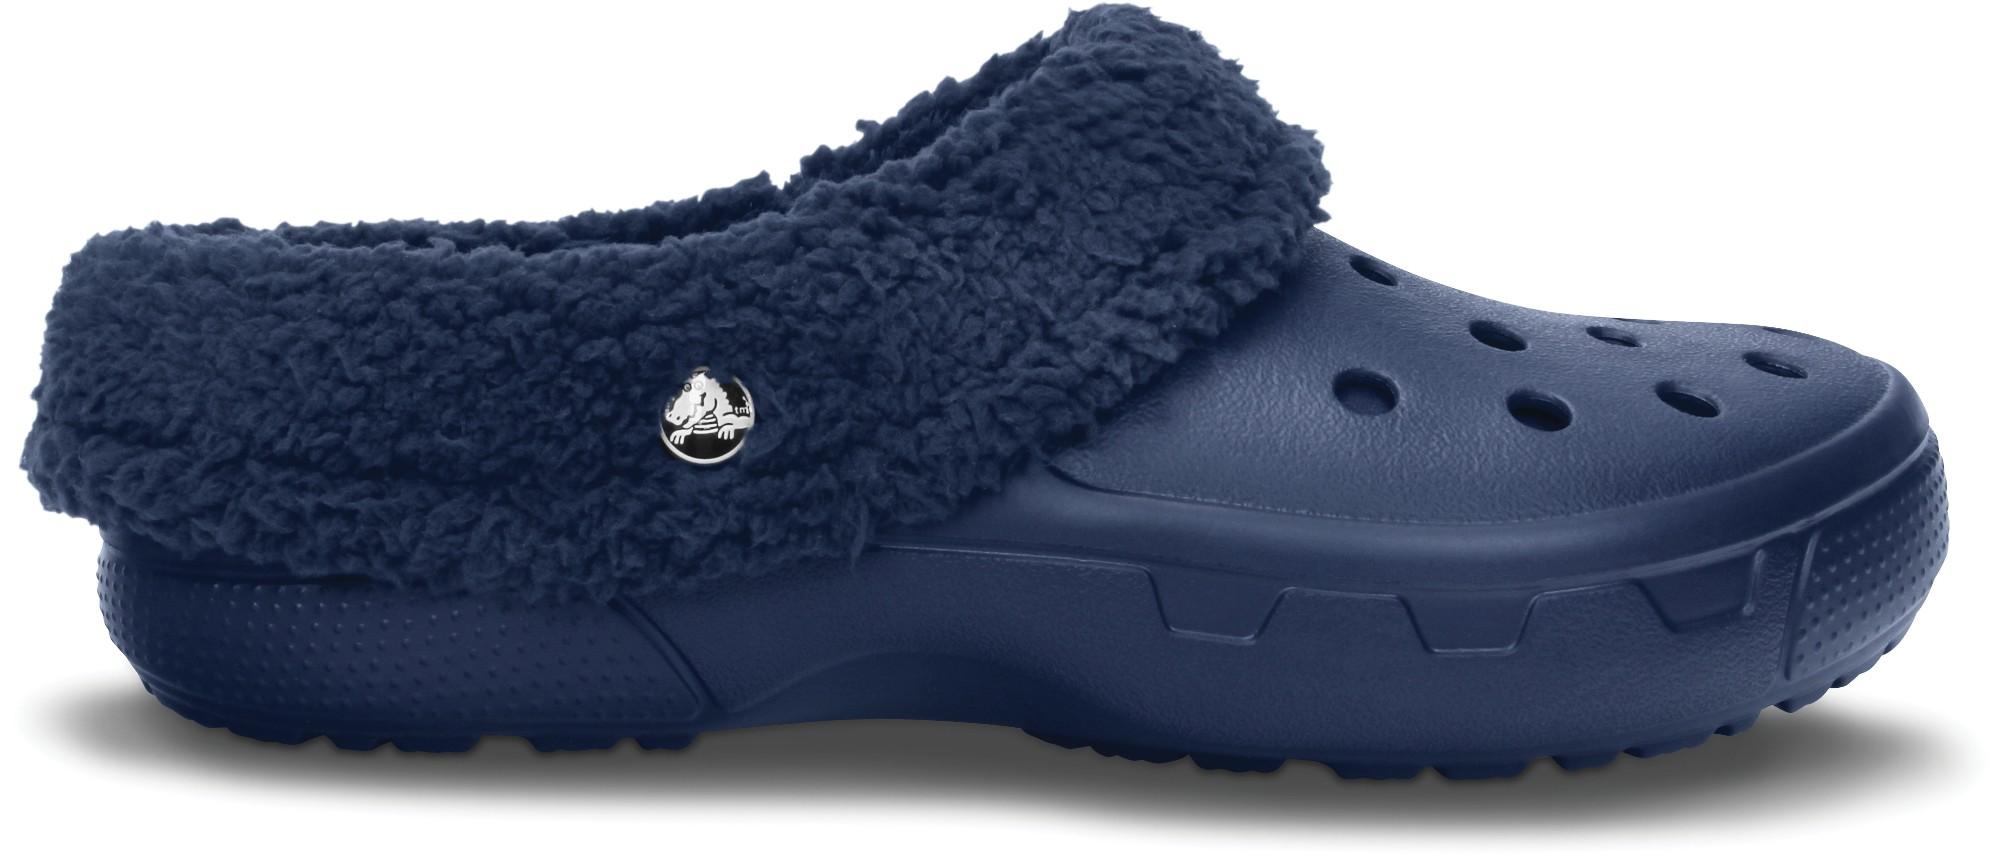 Crocs™ Mammoth Evo Clog Navy/Navy 39,5